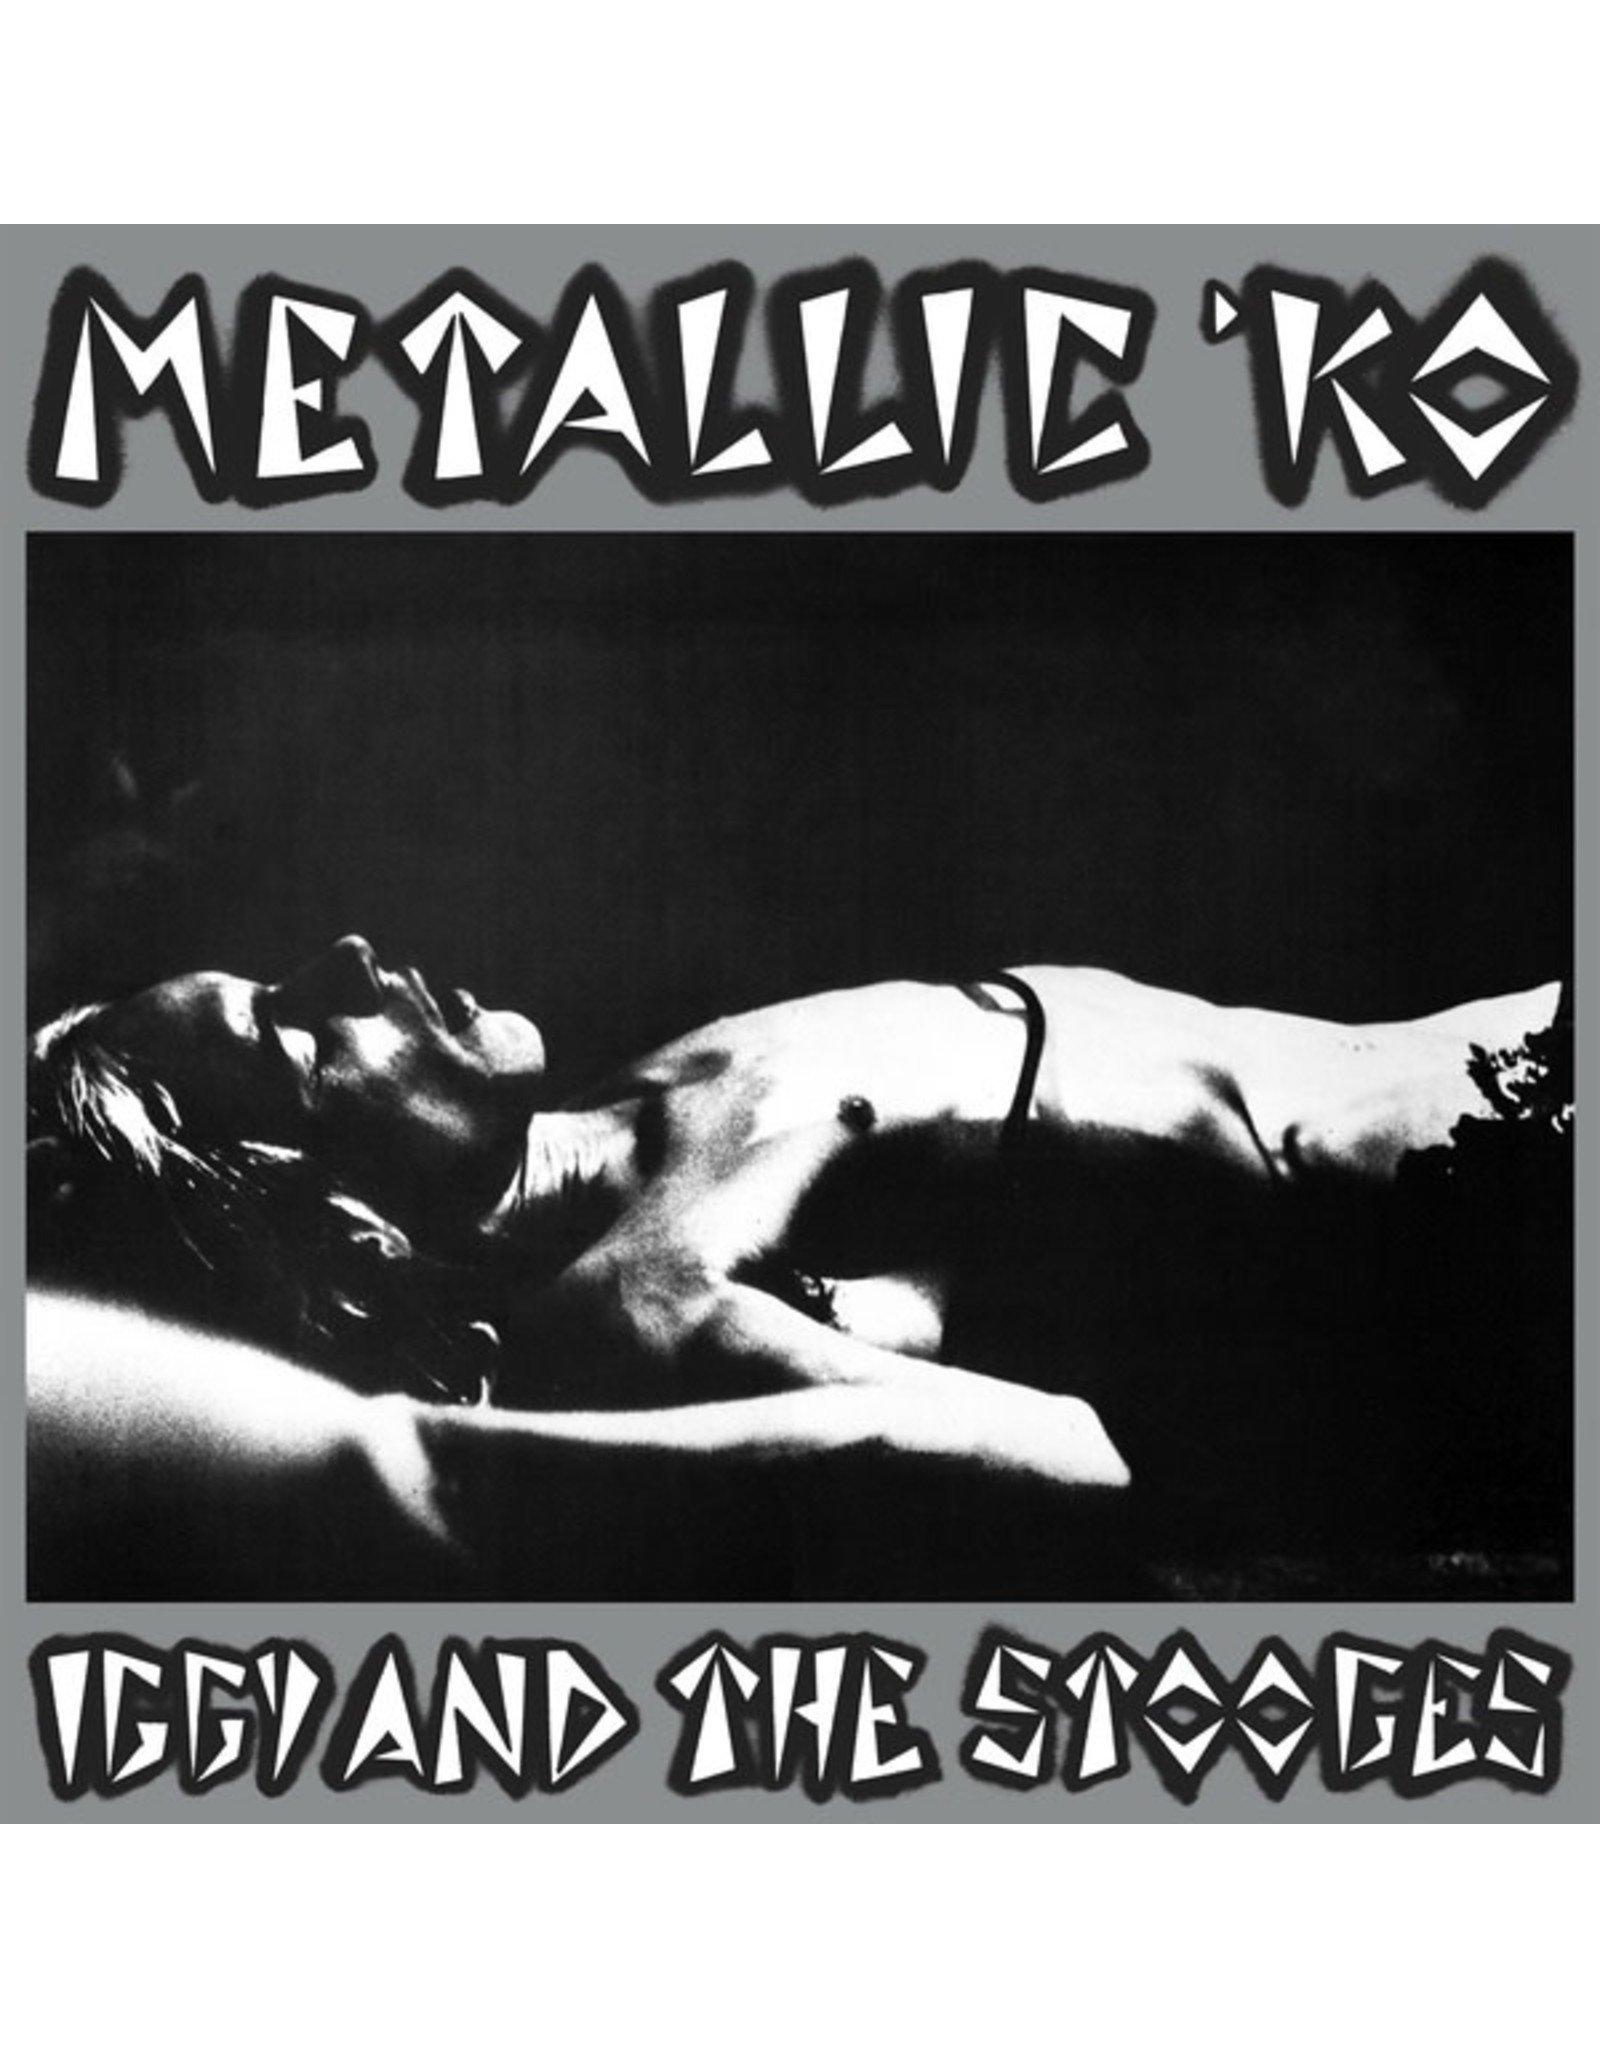 New Vinyl Iggy & The Stooges - Metallic K.O. LP